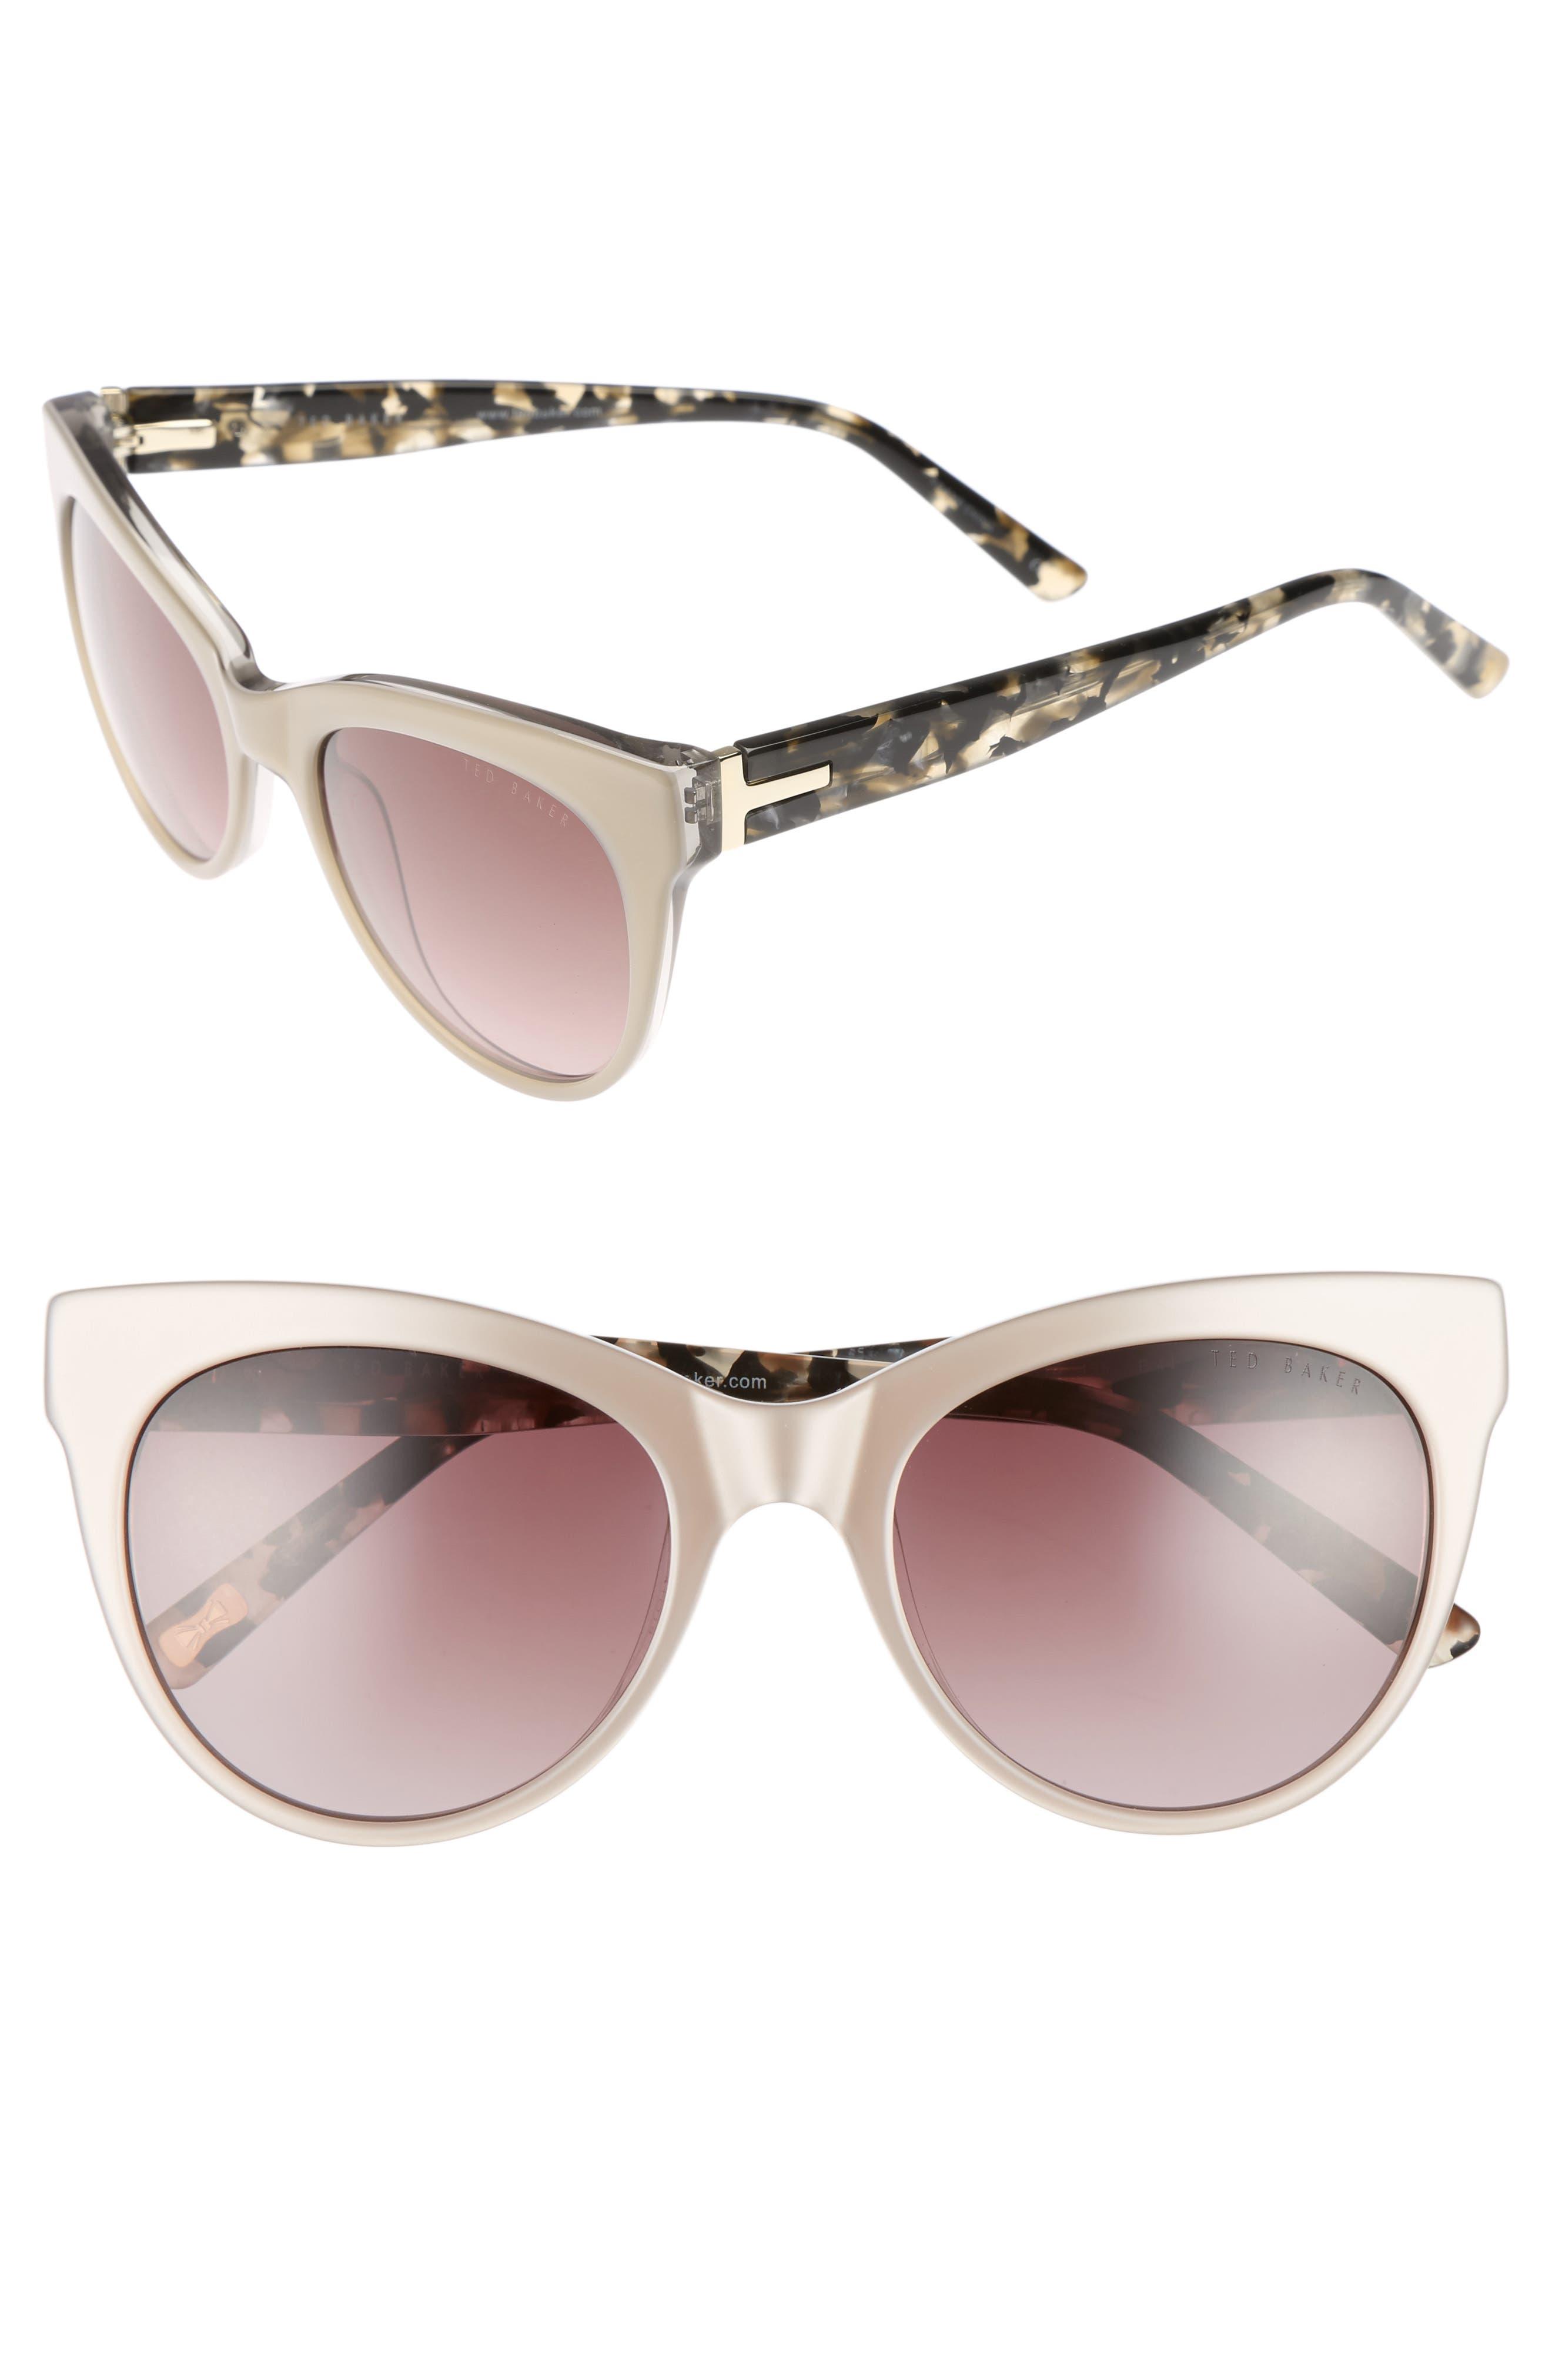 51mm Cat Eye Sunglasses,                             Main thumbnail 1, color,